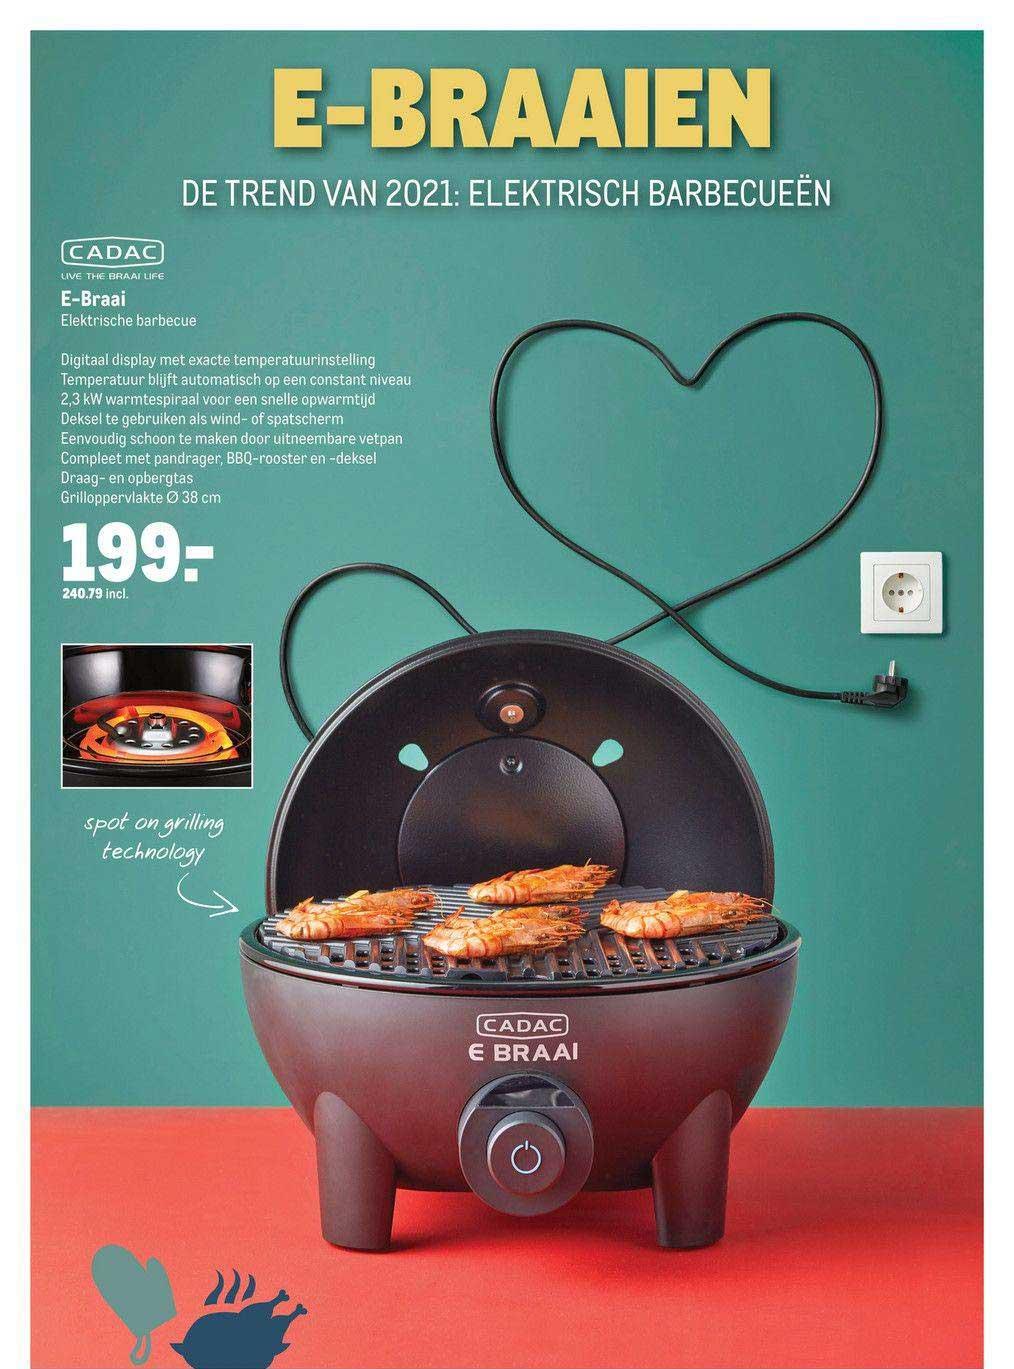 Makro Cadac E-Braai Elektrische Barbecue